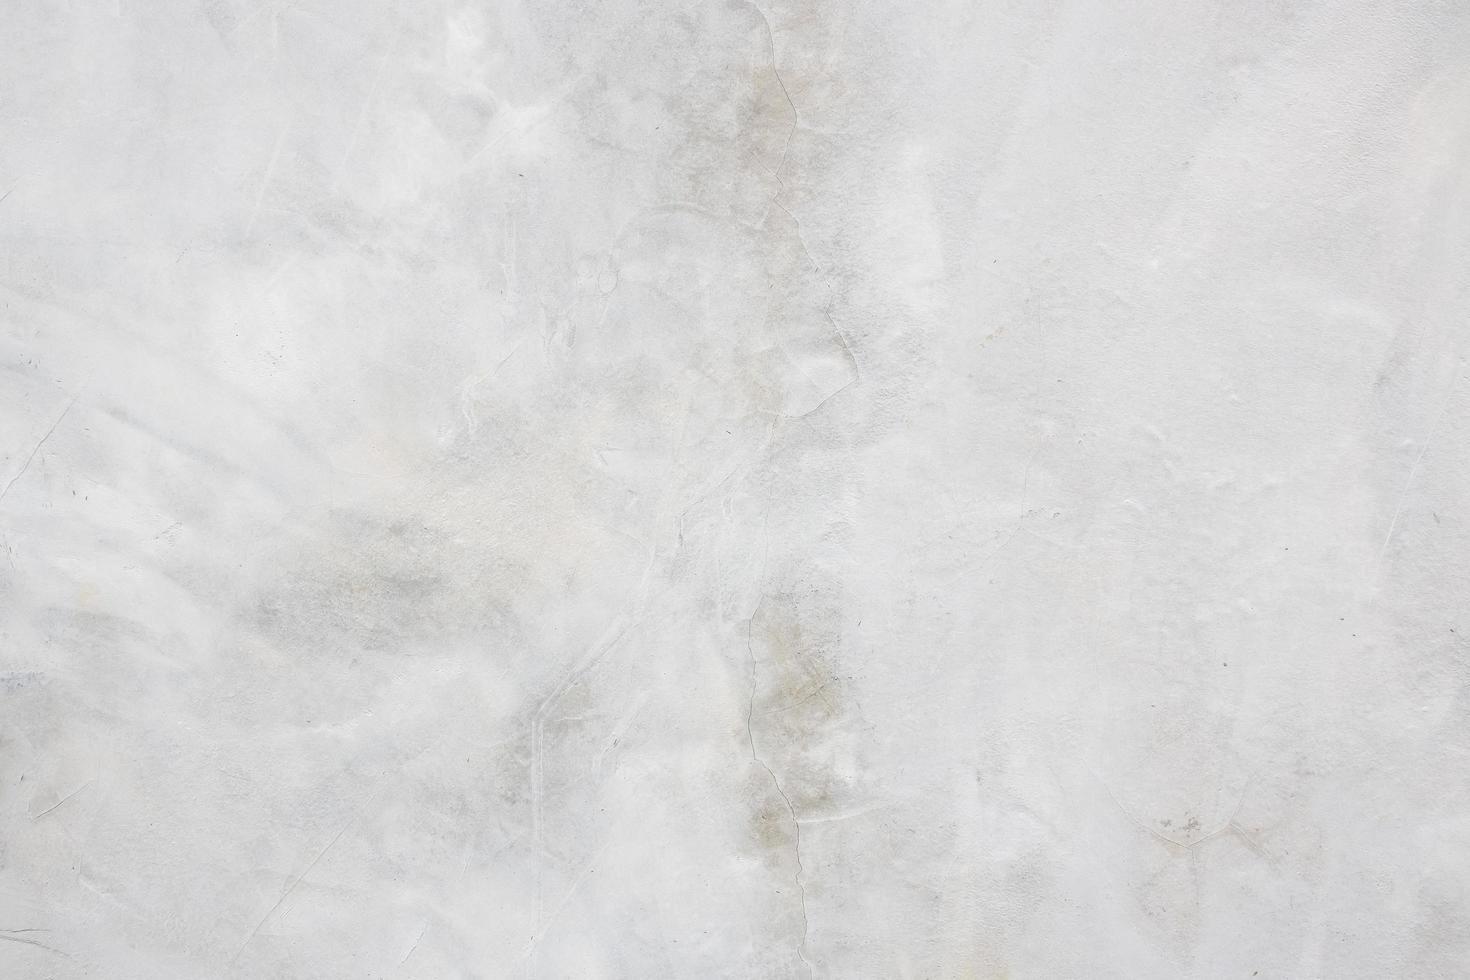 hellgraue Betonoberfläche foto